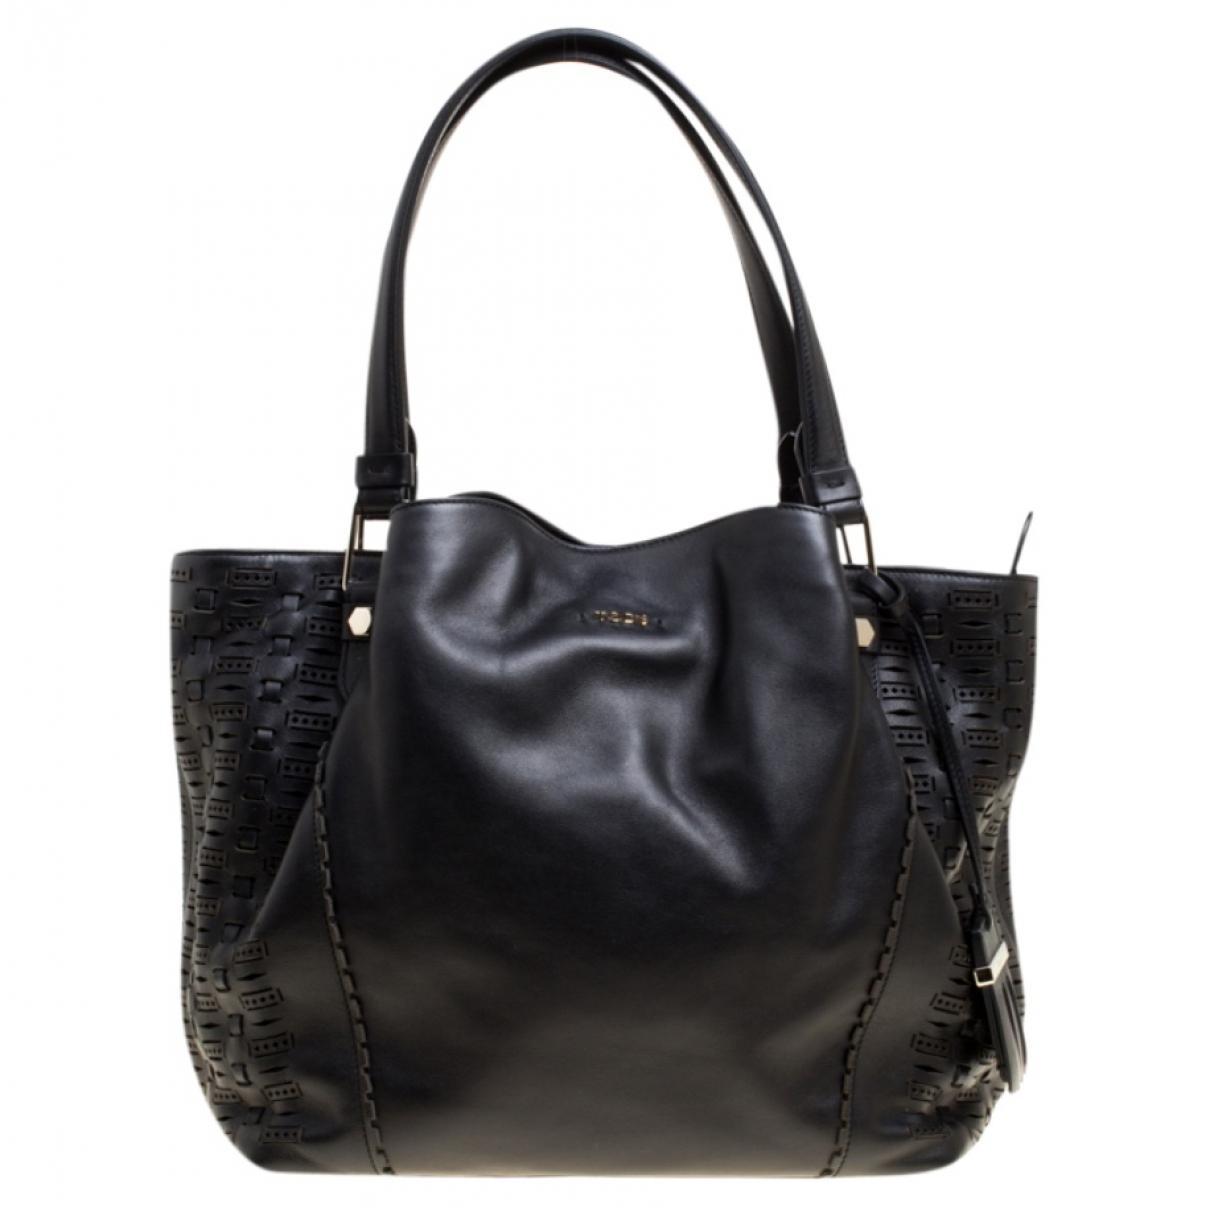 8de9435d6e6 Lyst - Tod's Pre-owned Black Leather Handbags in Black